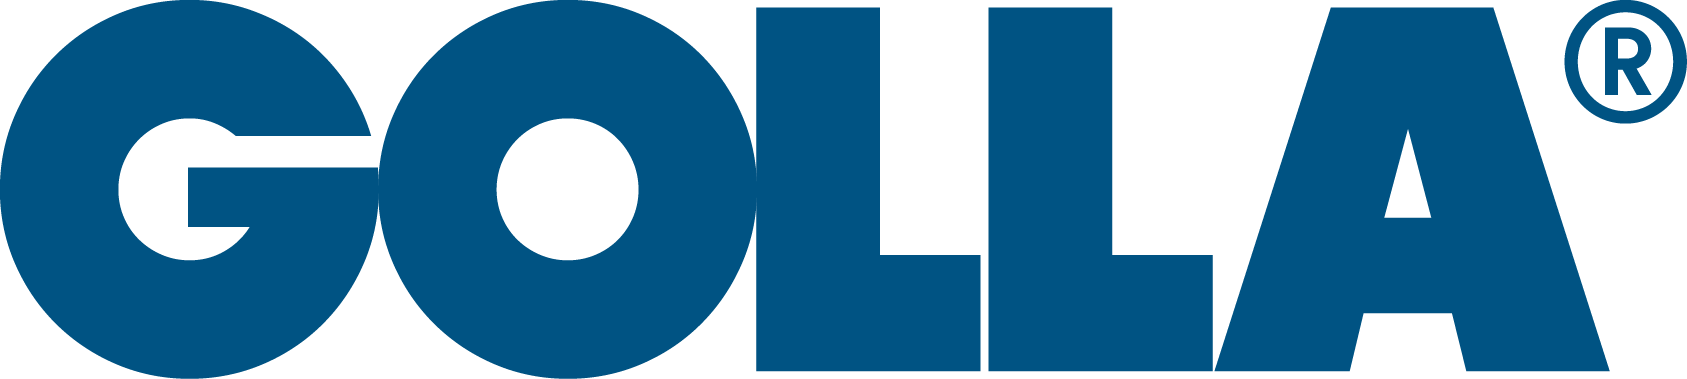 Golla_logo